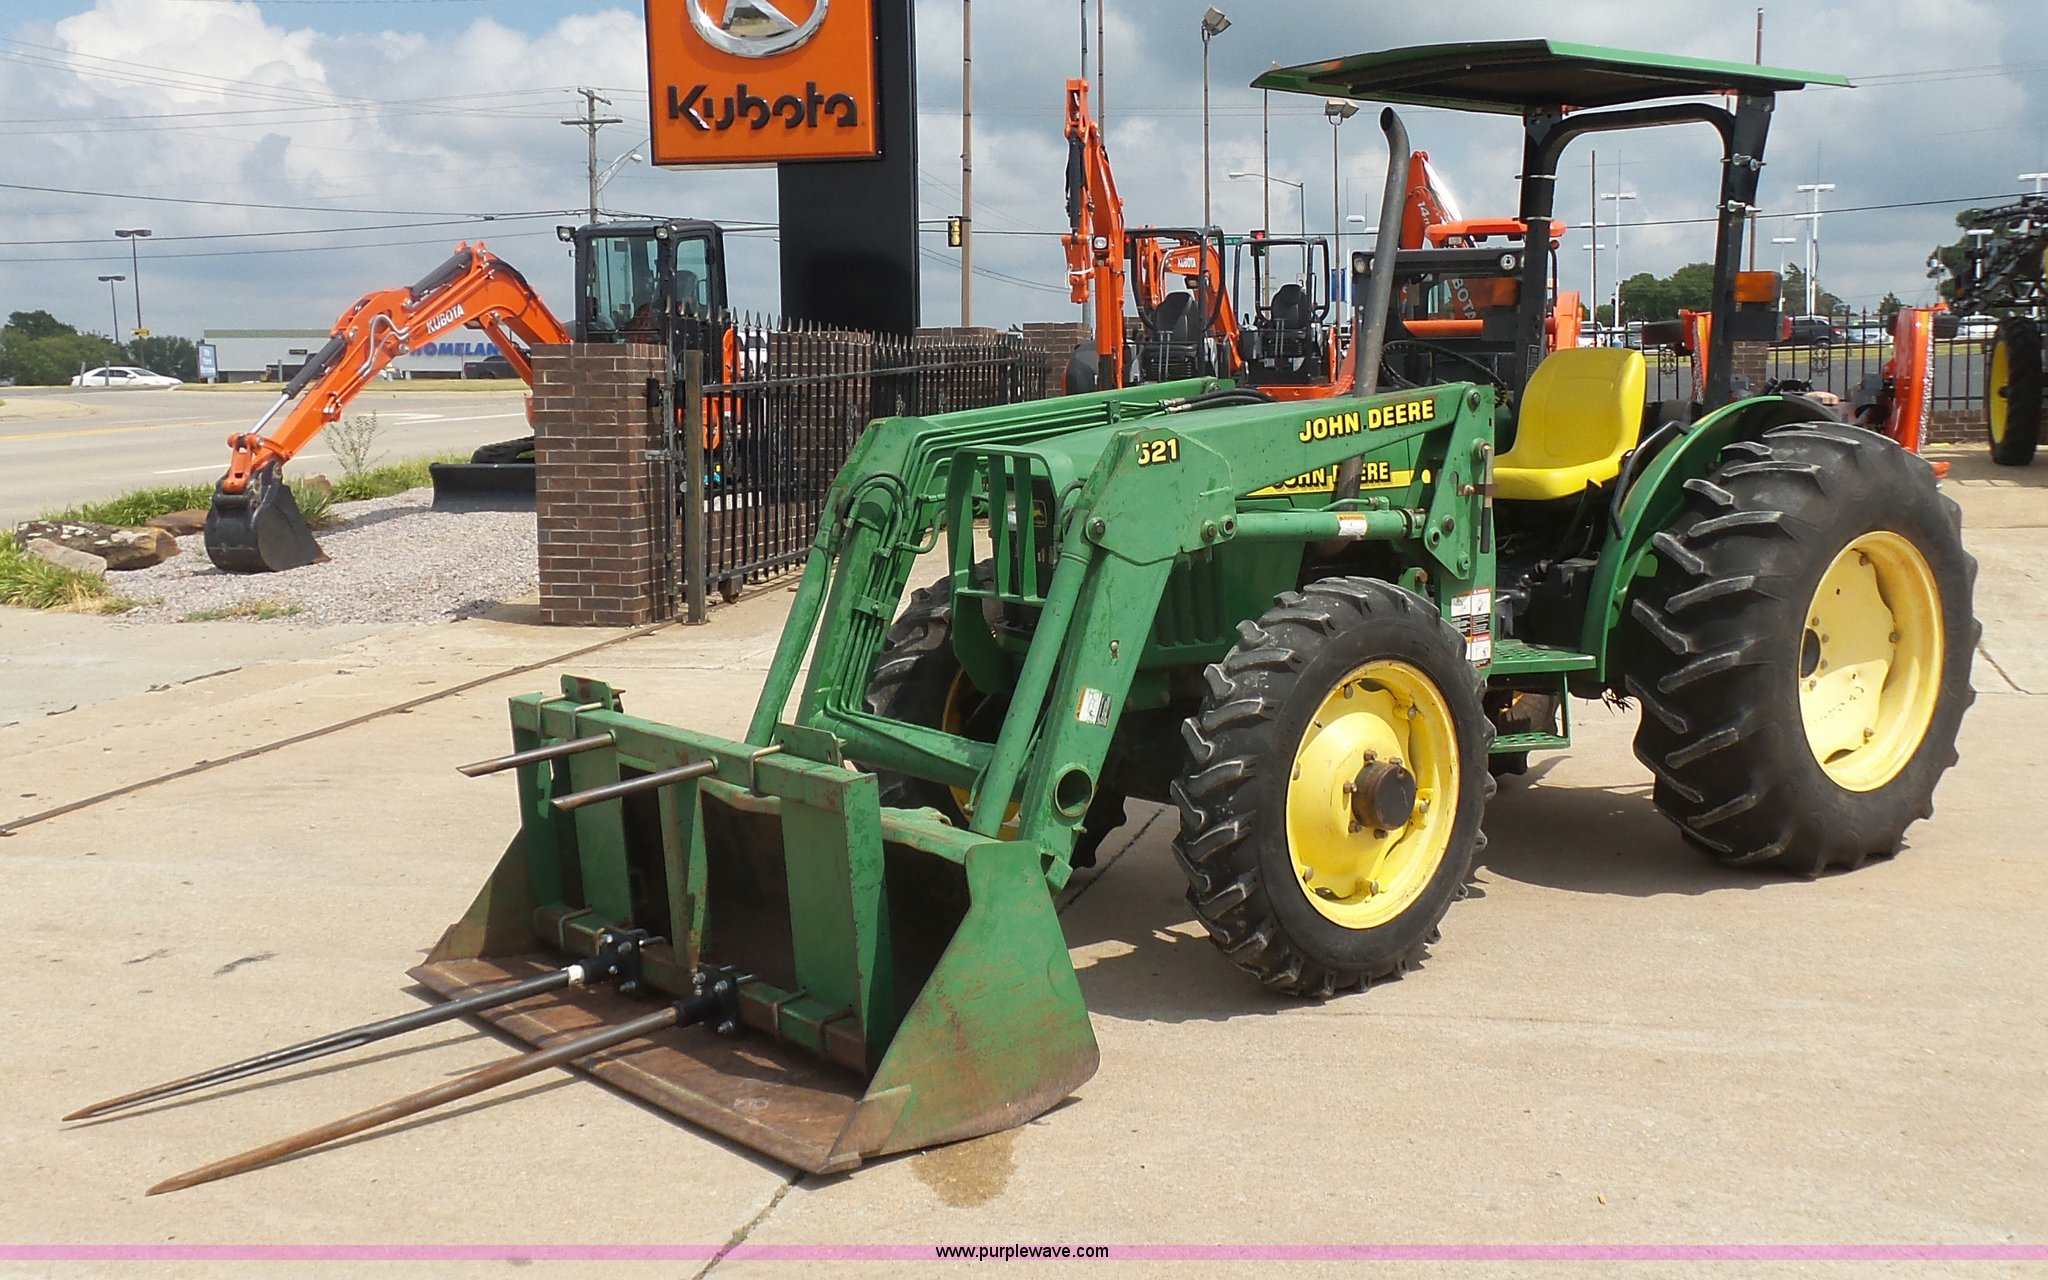 John Deere 5205 Mfwd Tractor Item L4779 Sold September. L4779 For Item John Deere 5205. John Deere. John Deere 5205 Pto Diagram At Scoala.co